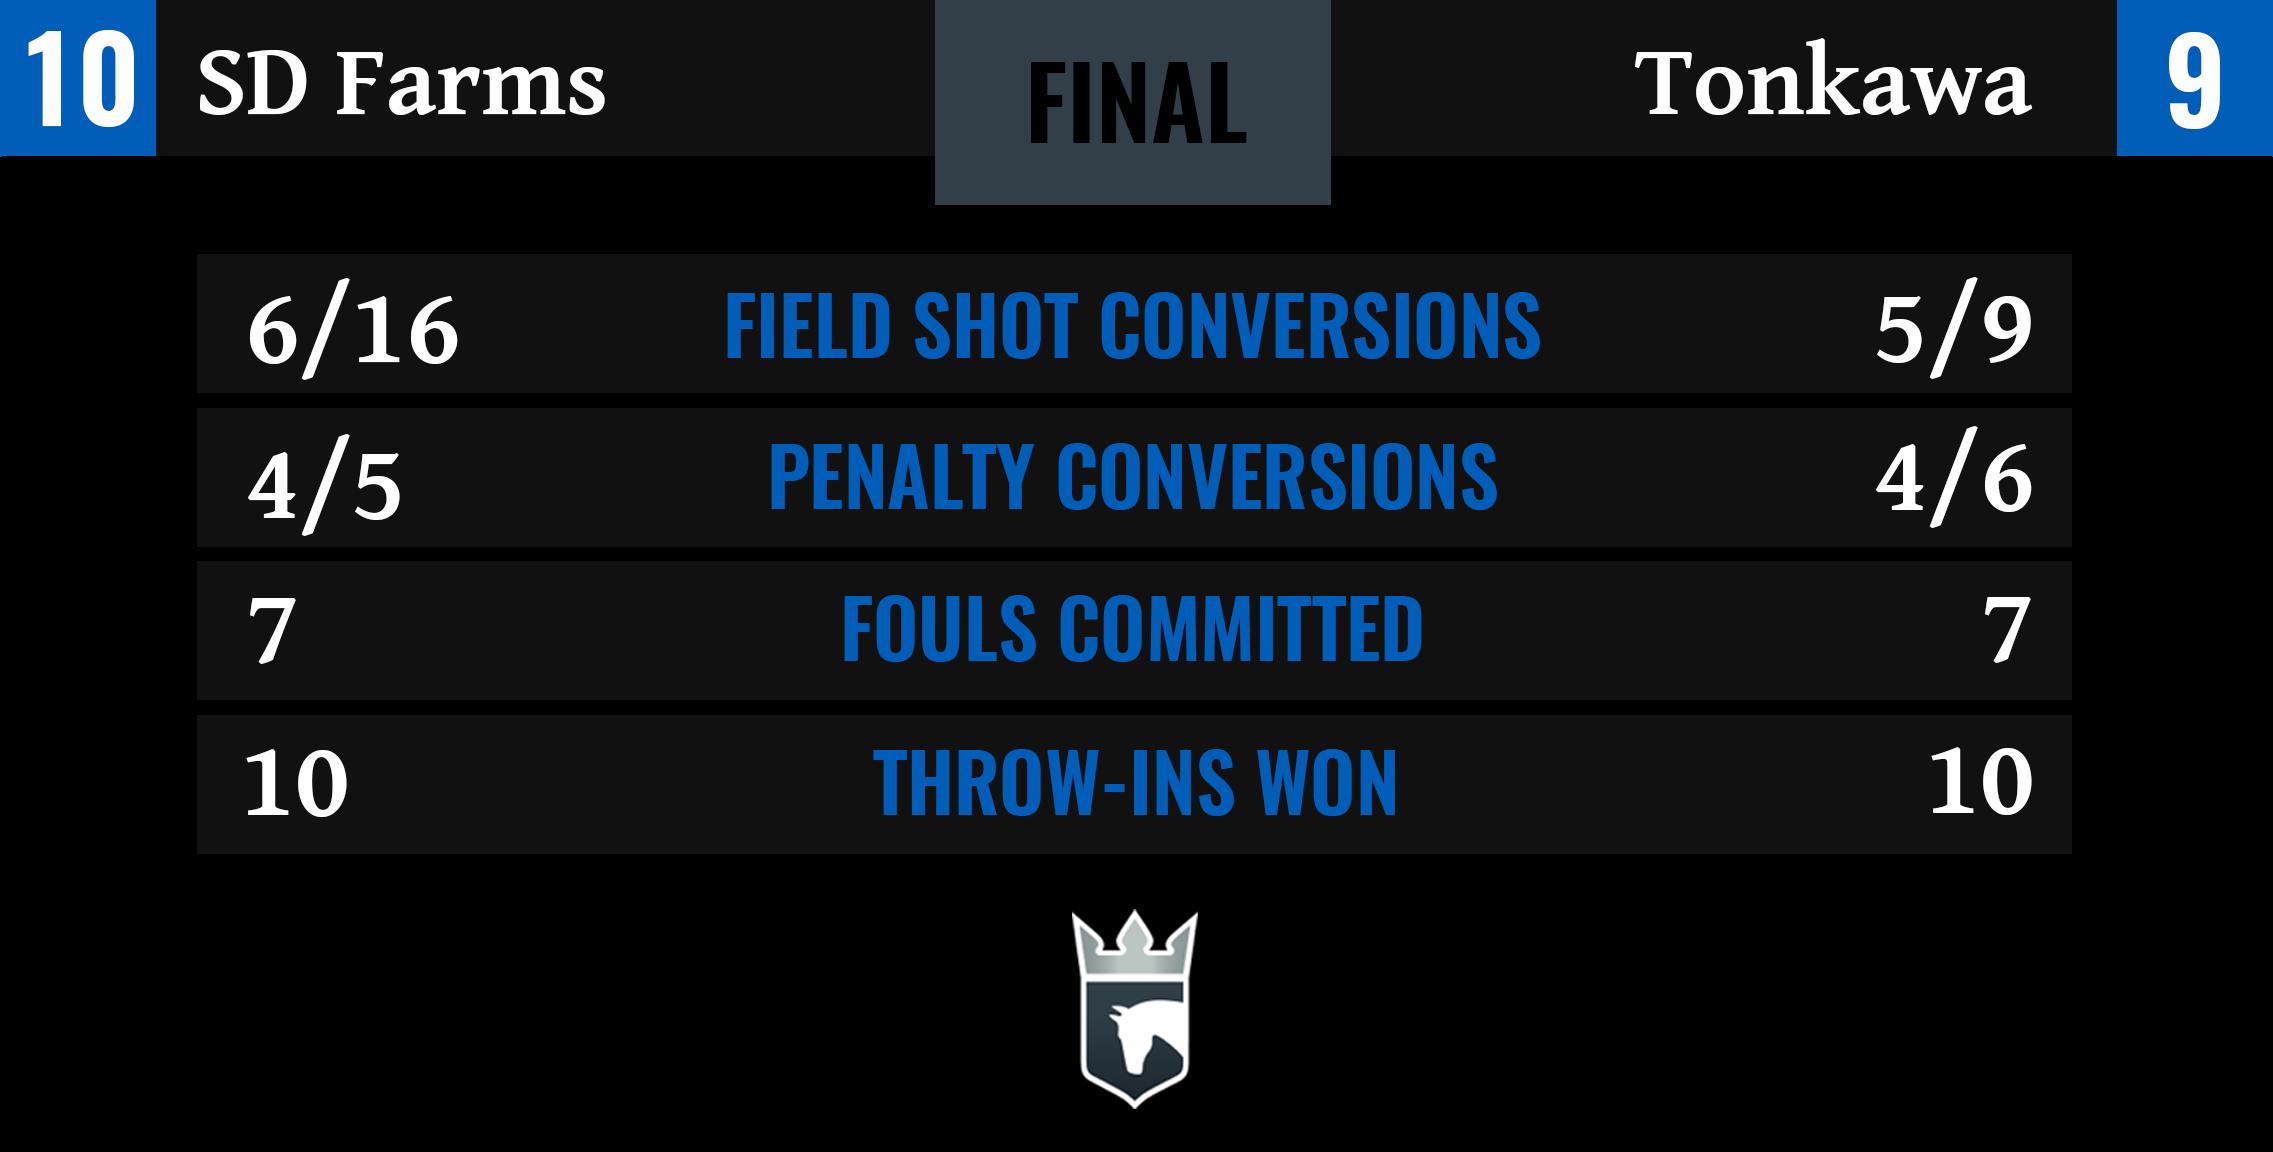 SD Farms vs Tonkawa Final Stats